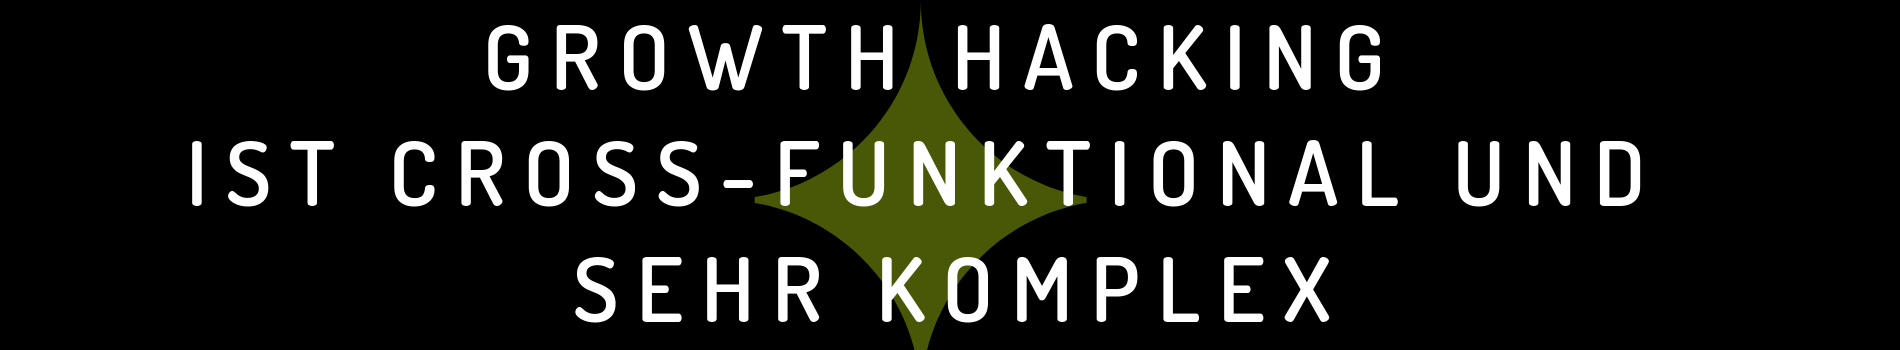 Growth Hack ist cross-funktional | DIGITAL Marketing Expert